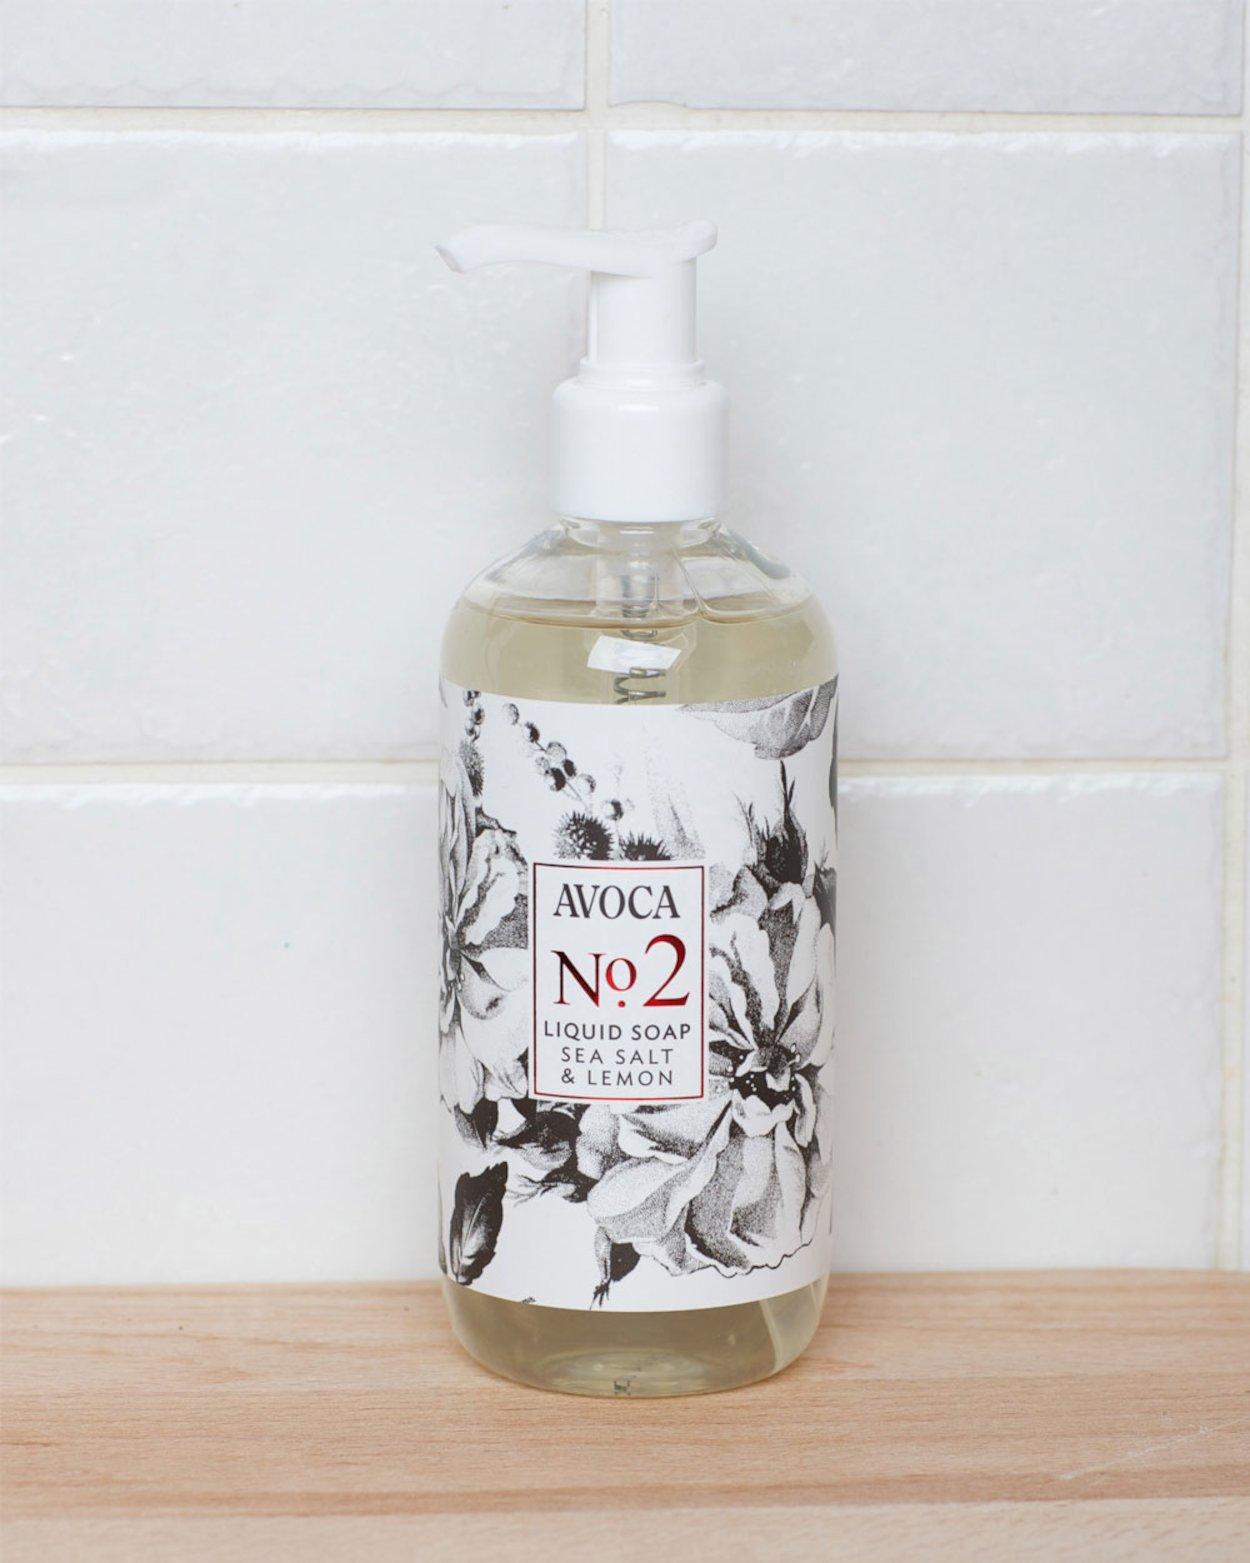 Avoca No 2 Liquid Soap - Sea Salt & Lemon